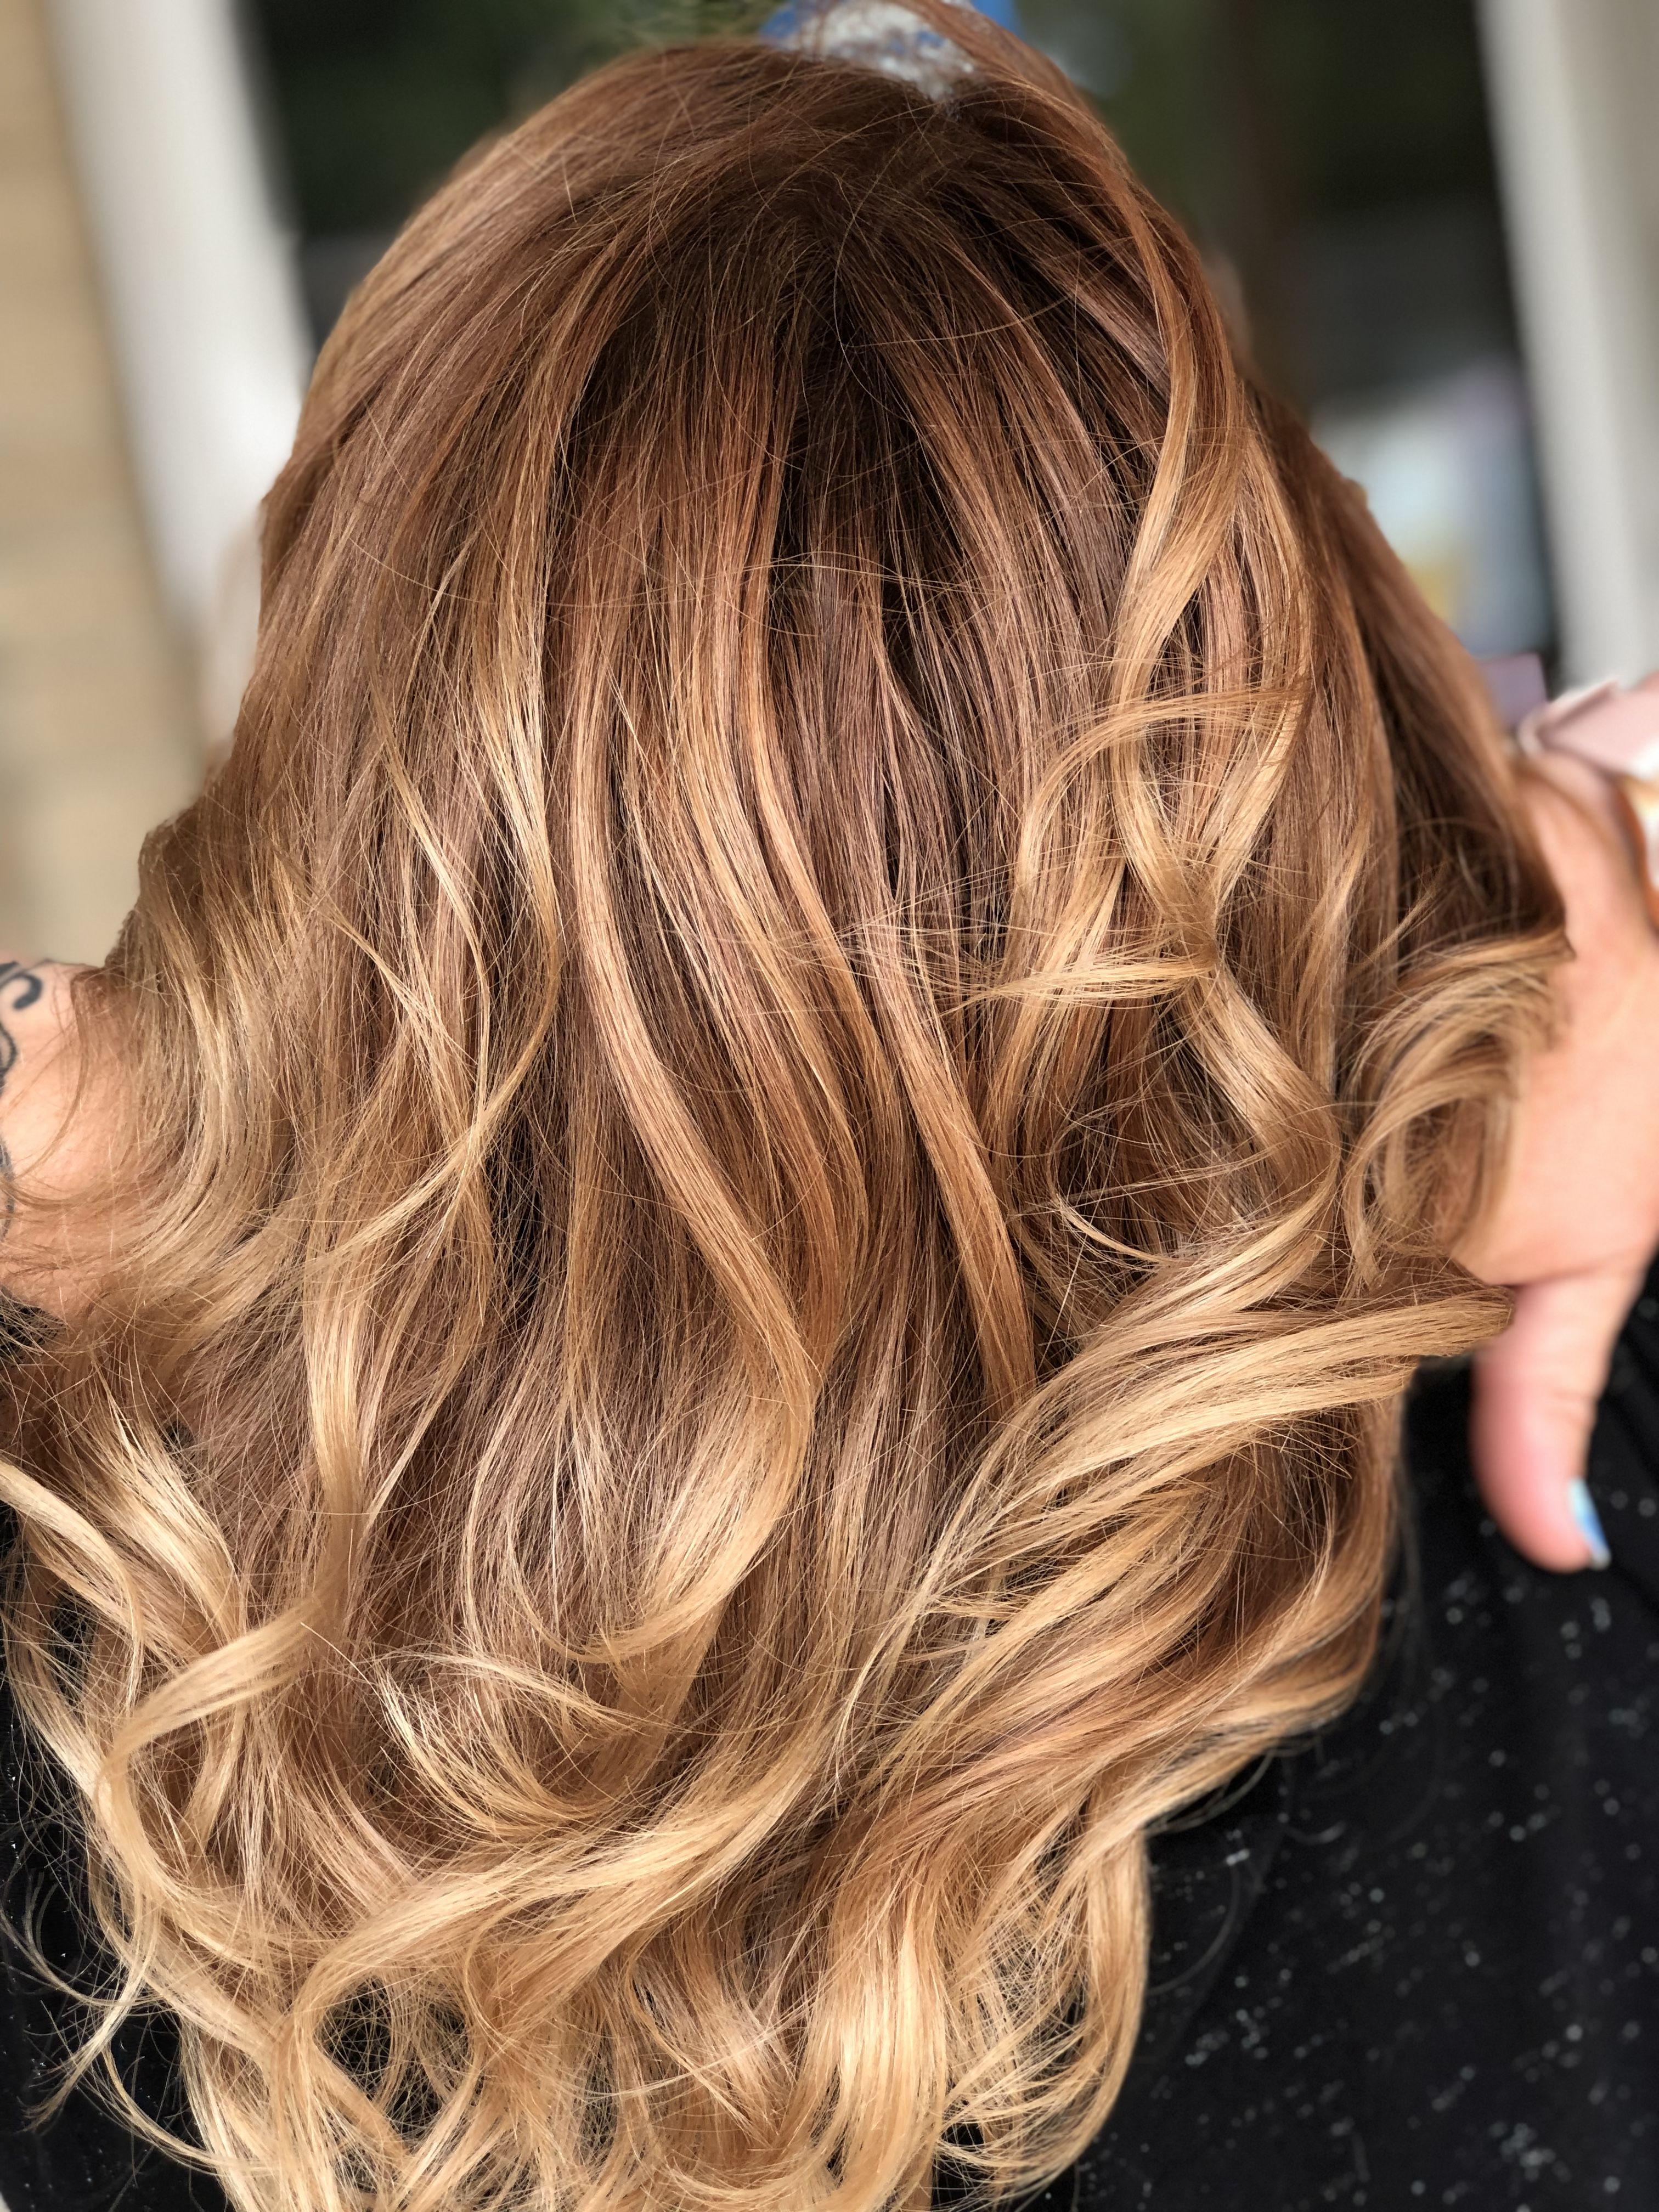 Copper Hair By Ashley Hair Copper Blonde Balayage Blonde Balayage